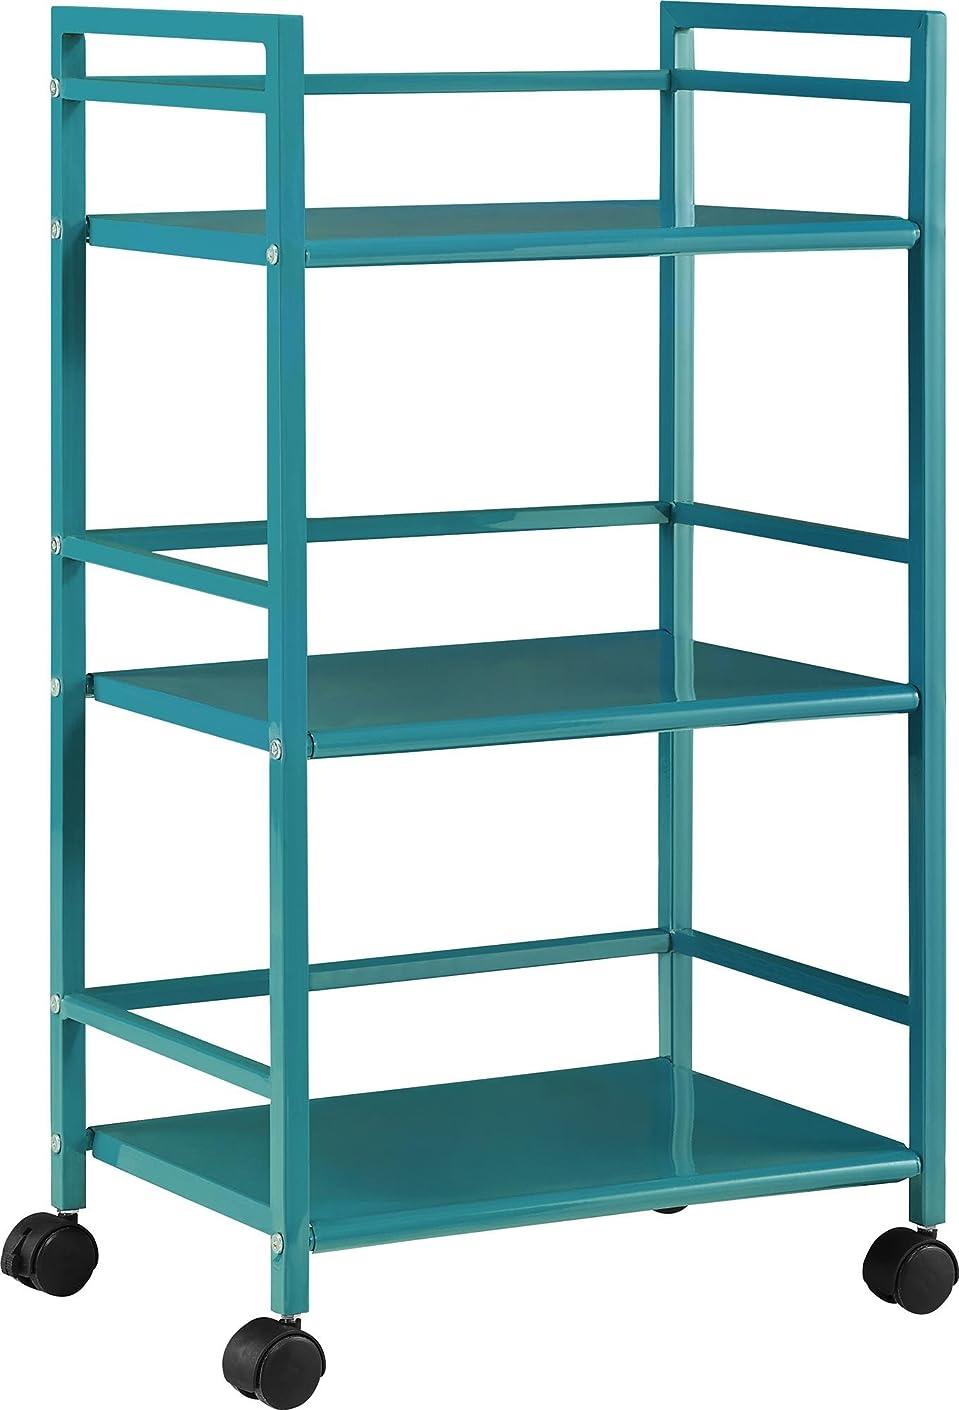 Ameriwood Home 7741396PCOM Marshall 3-Shelf Metal Rolling Utility Cart, Teal